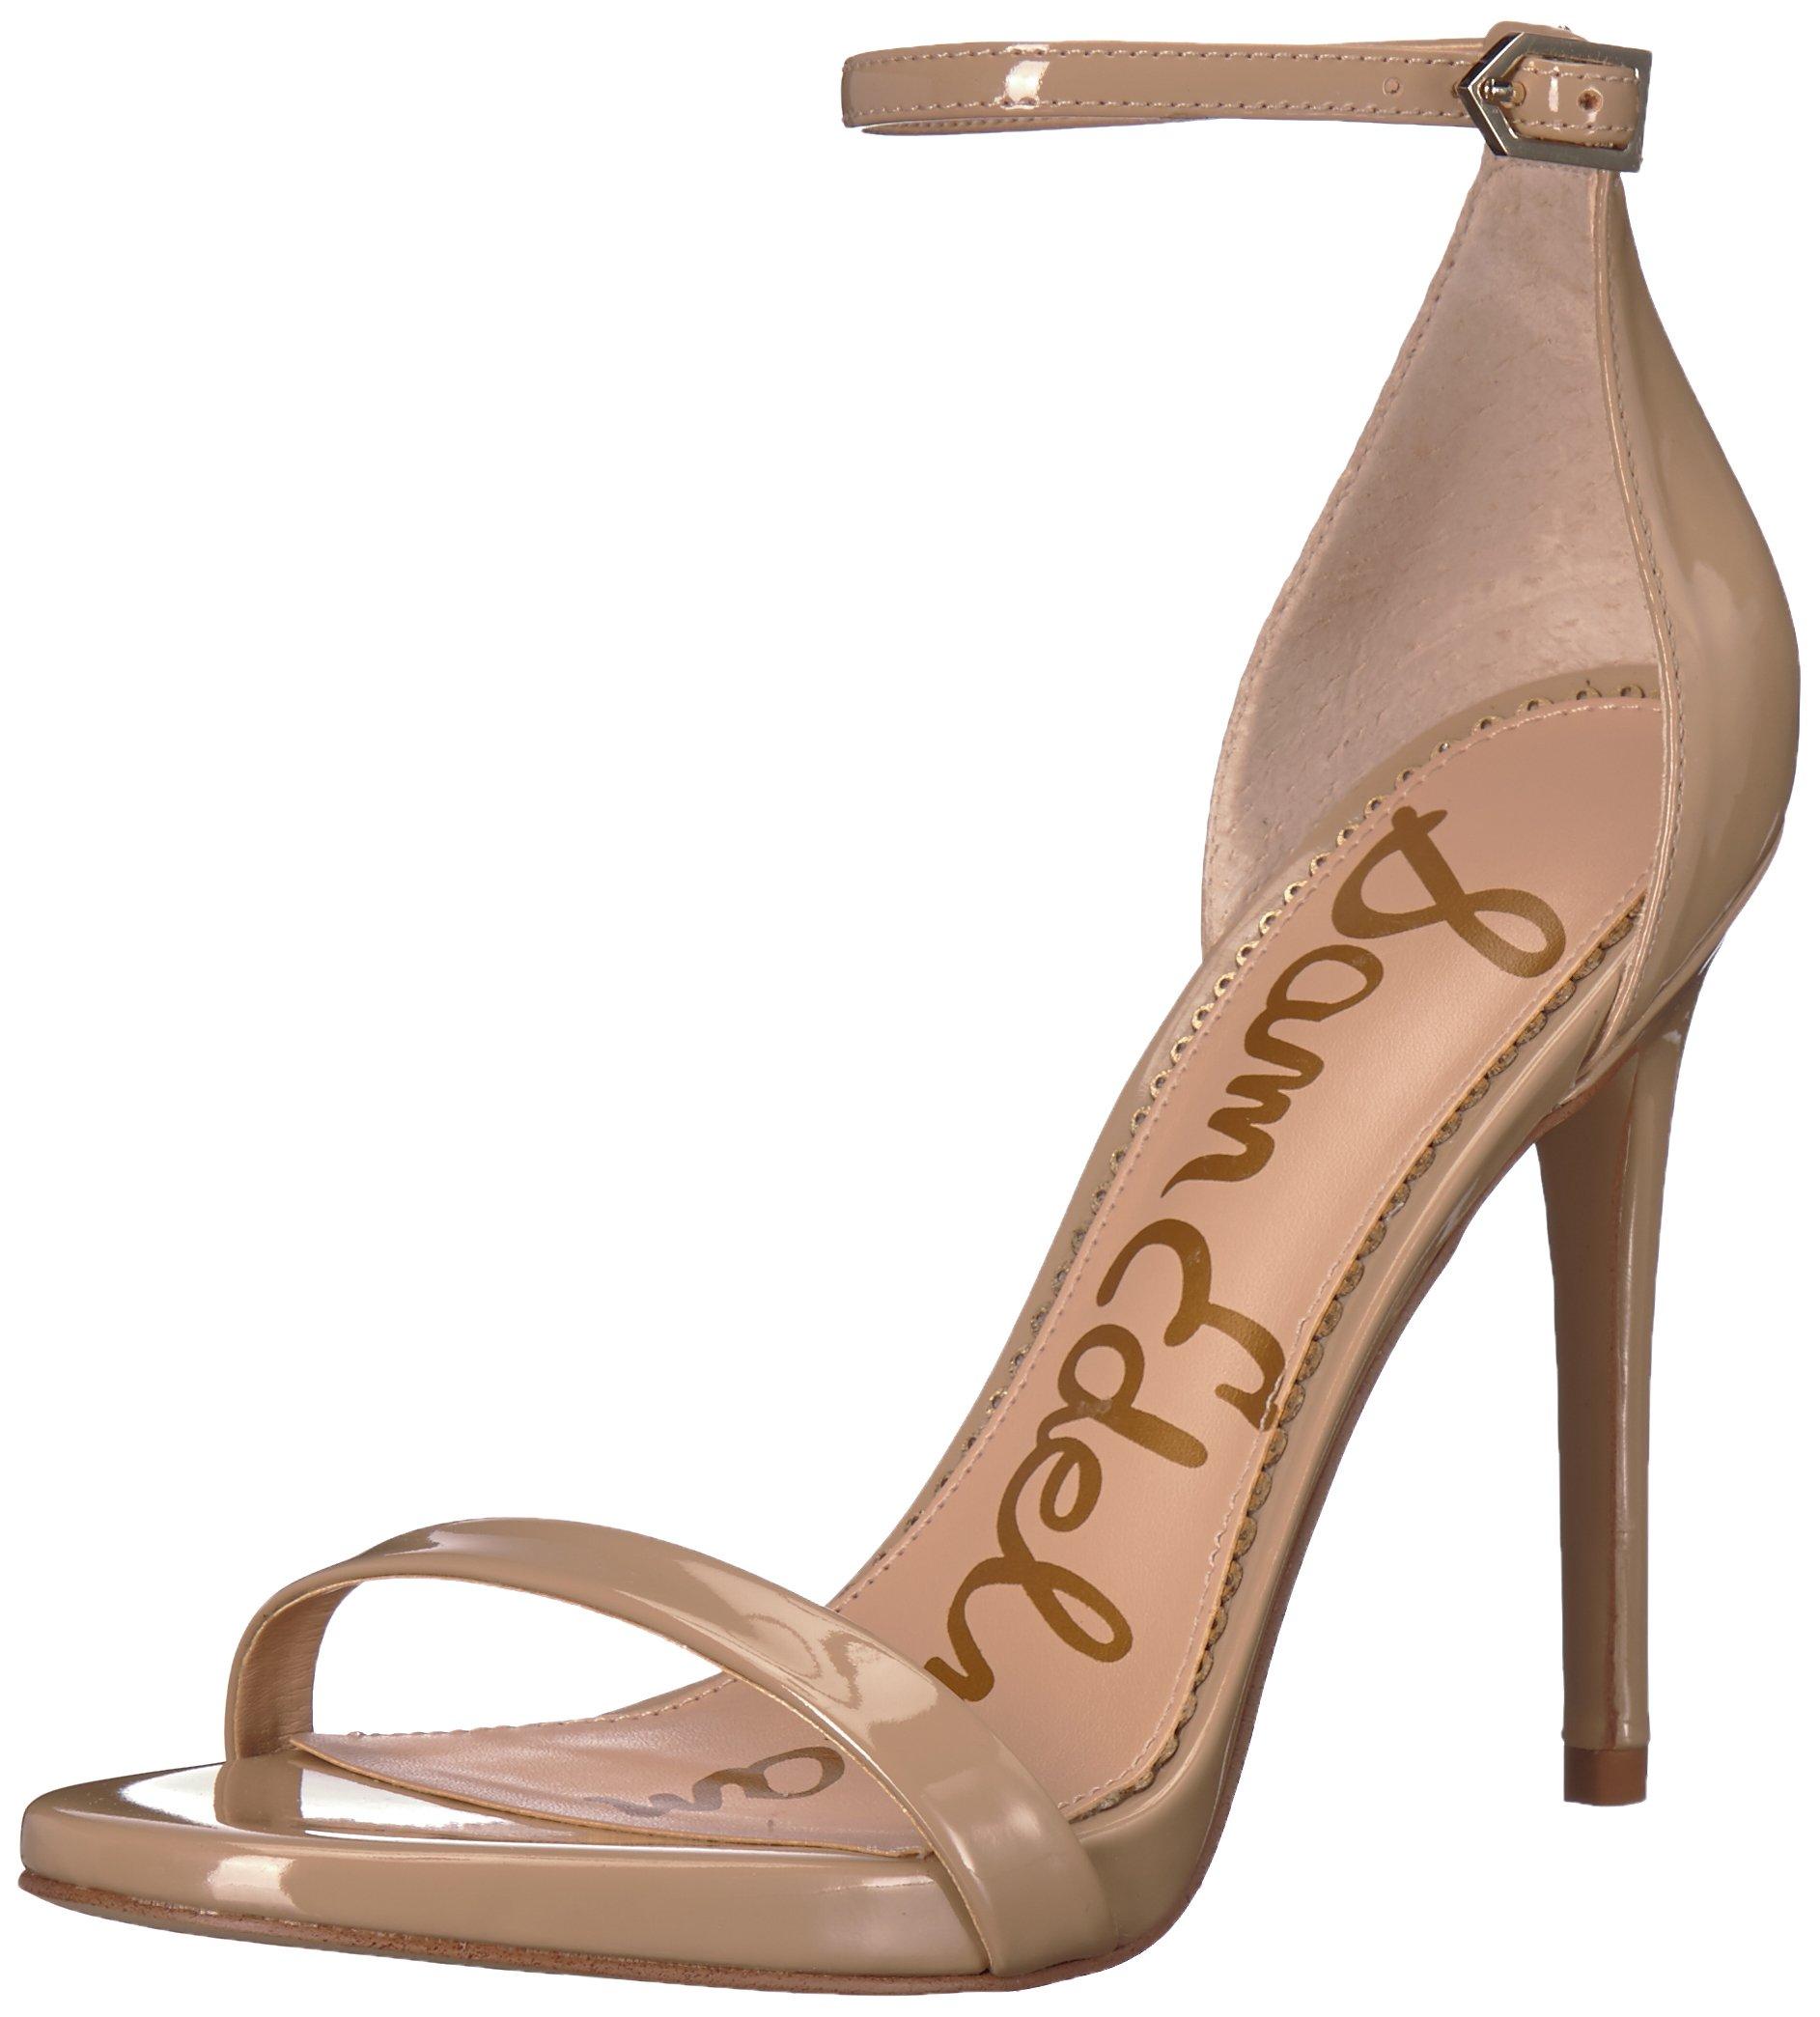 Sam Edelman Women's Ariella Heeled Sandal, Classic Nude Patent, 6 M US